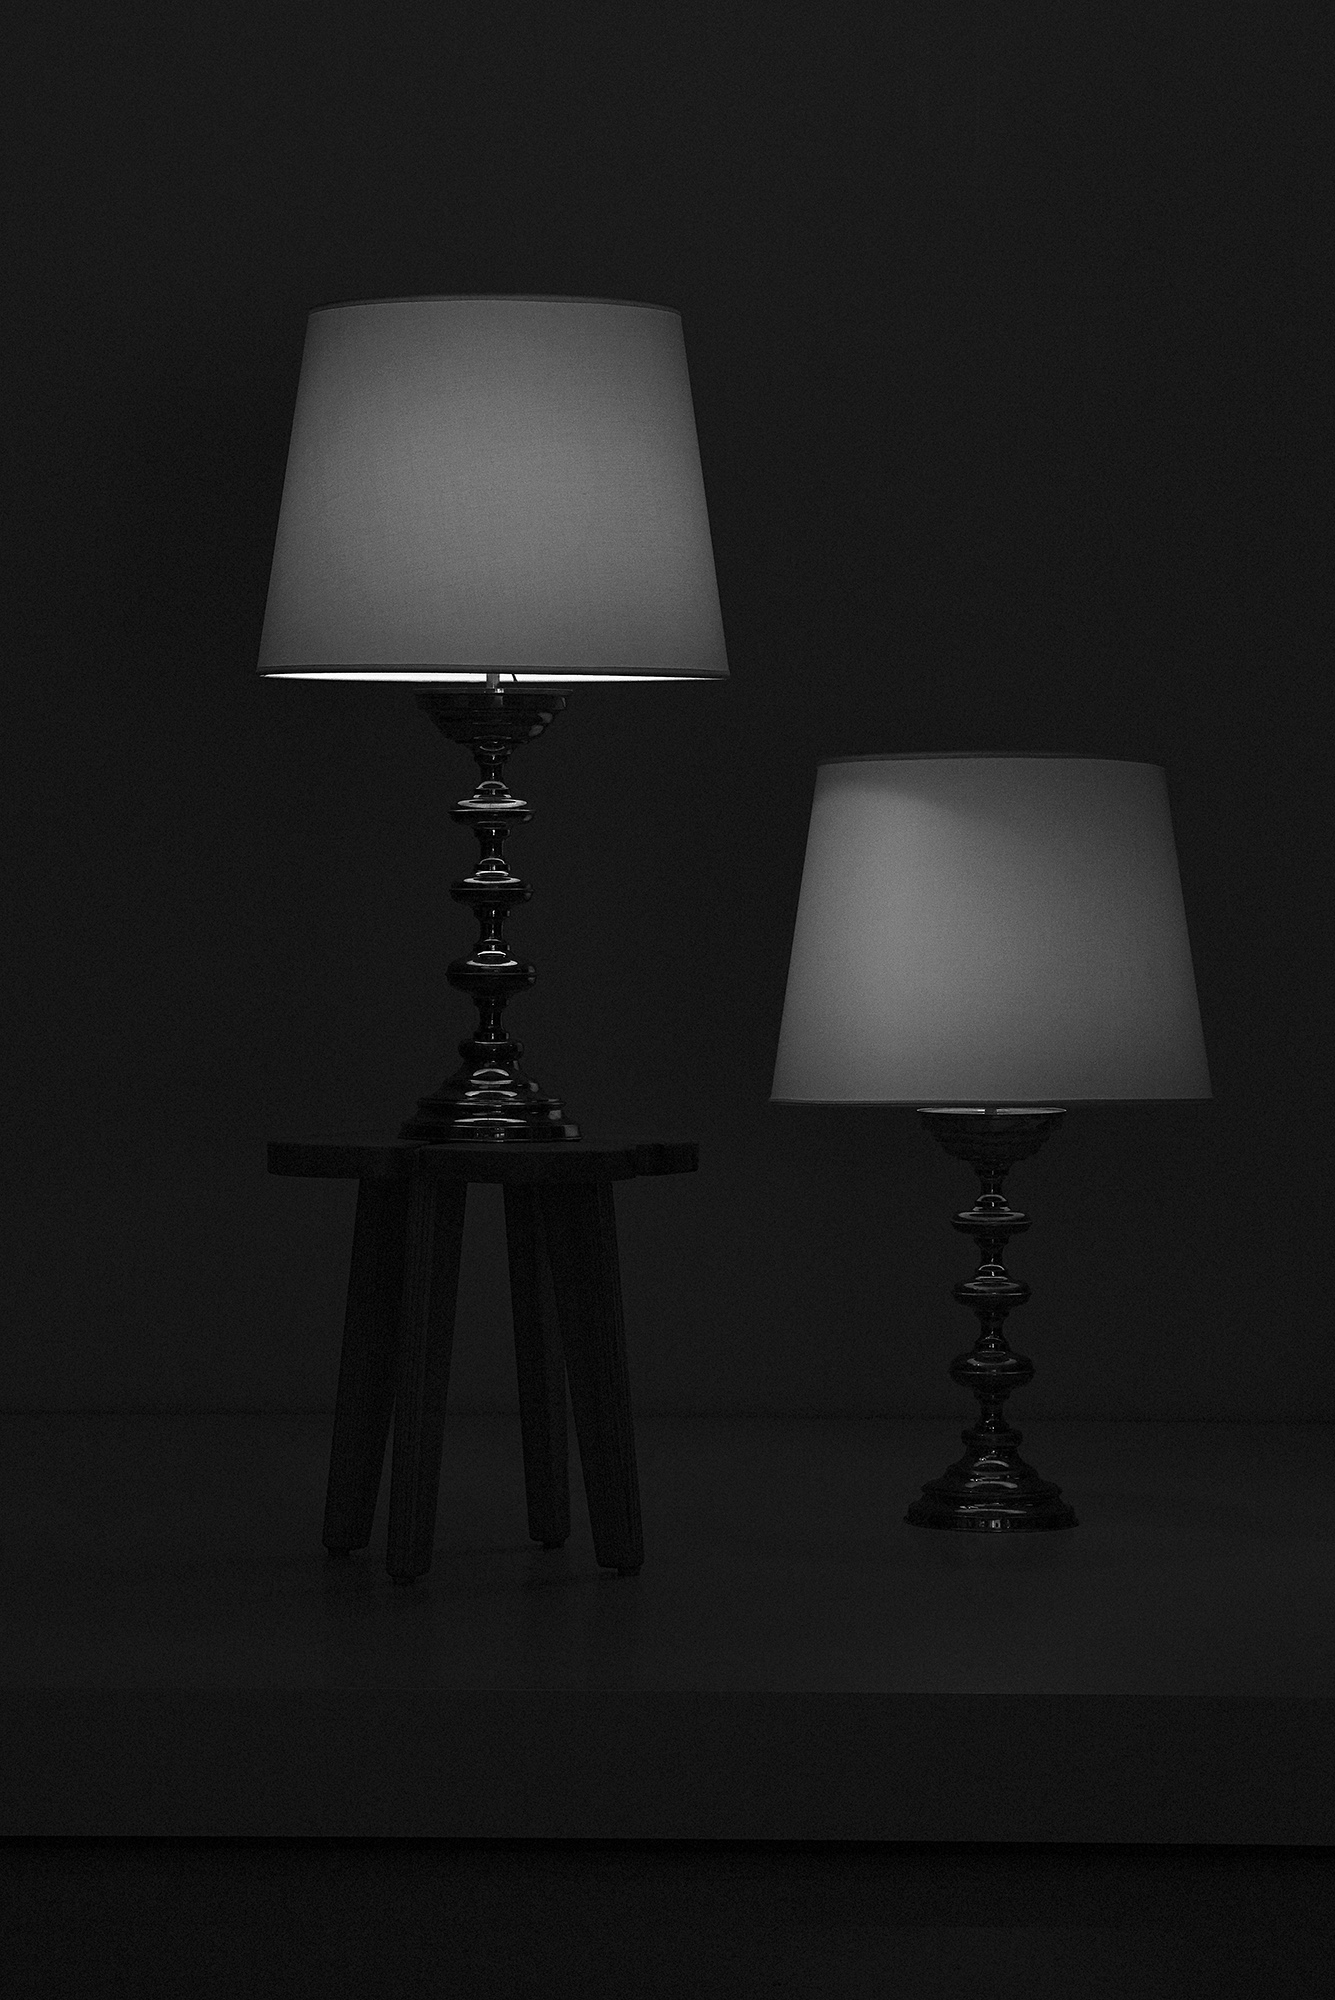 180806 Original in Berlin Lamp Study N° 093.jpg